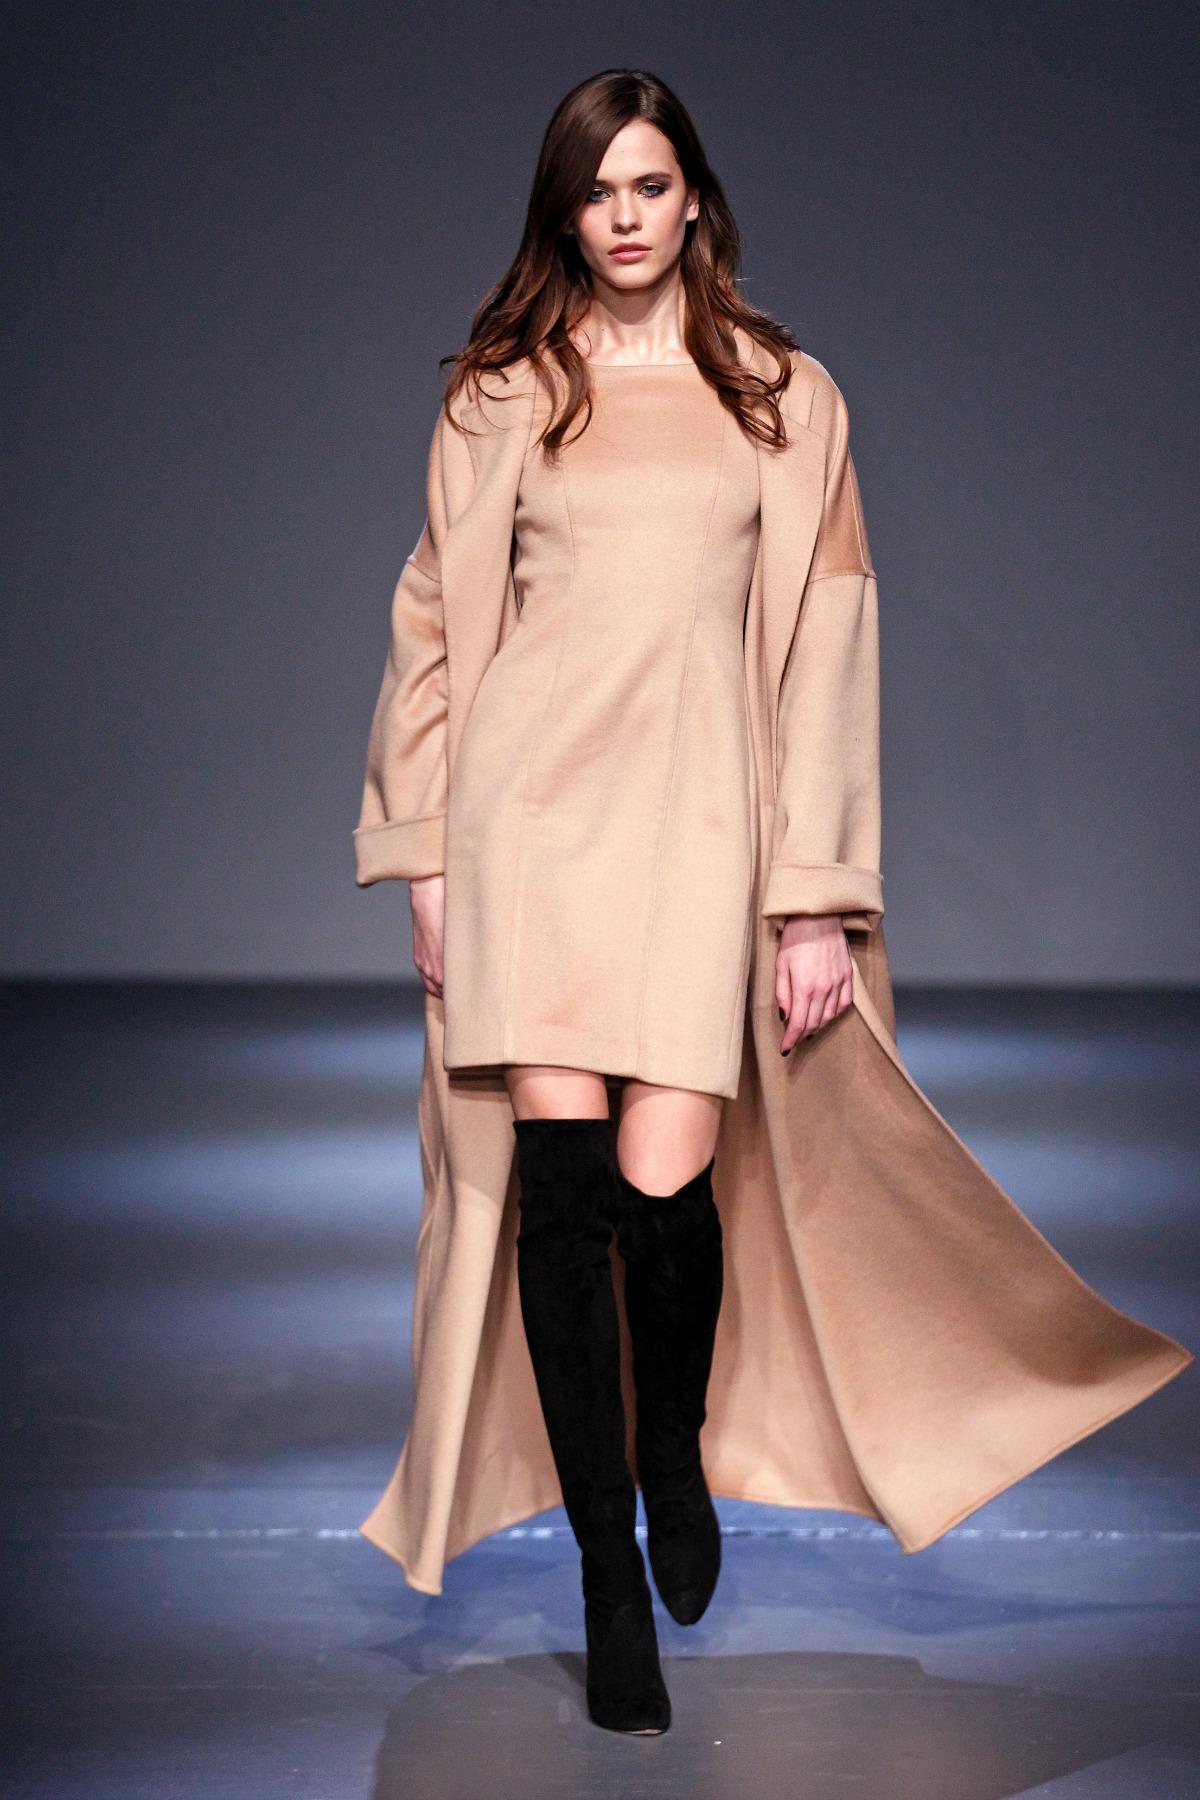 Pamella Roland Fall 2018 Runway I Camel Cashmere Coat and Sheath Dress #NYFW #FallFashion